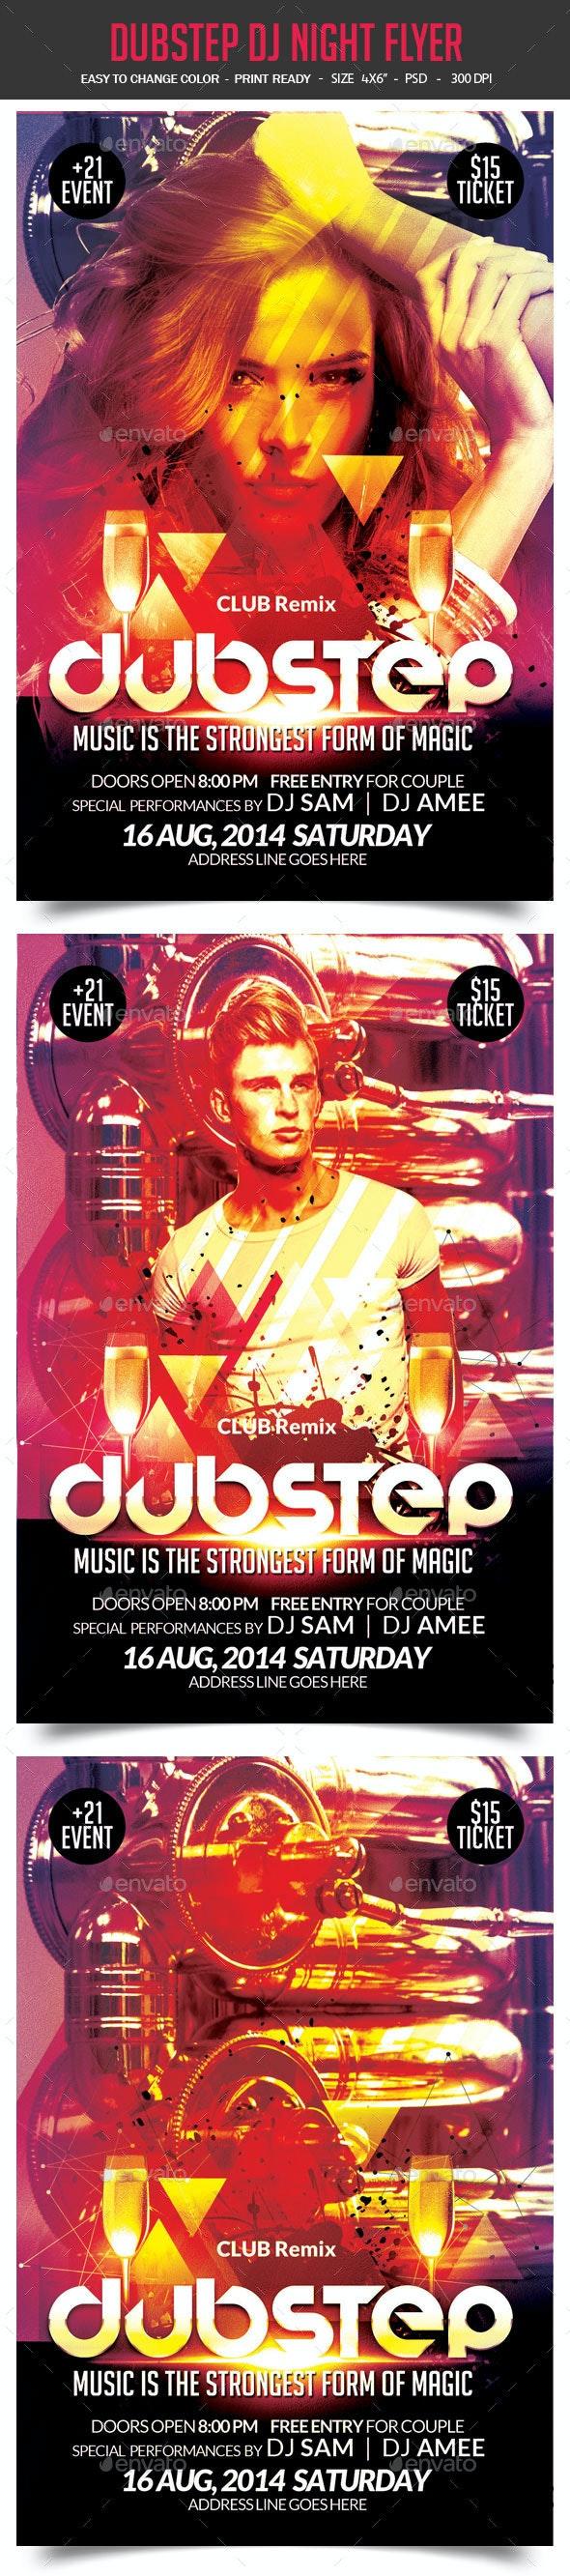 Dubstep DJ Night Flyer - Clubs & Parties Events